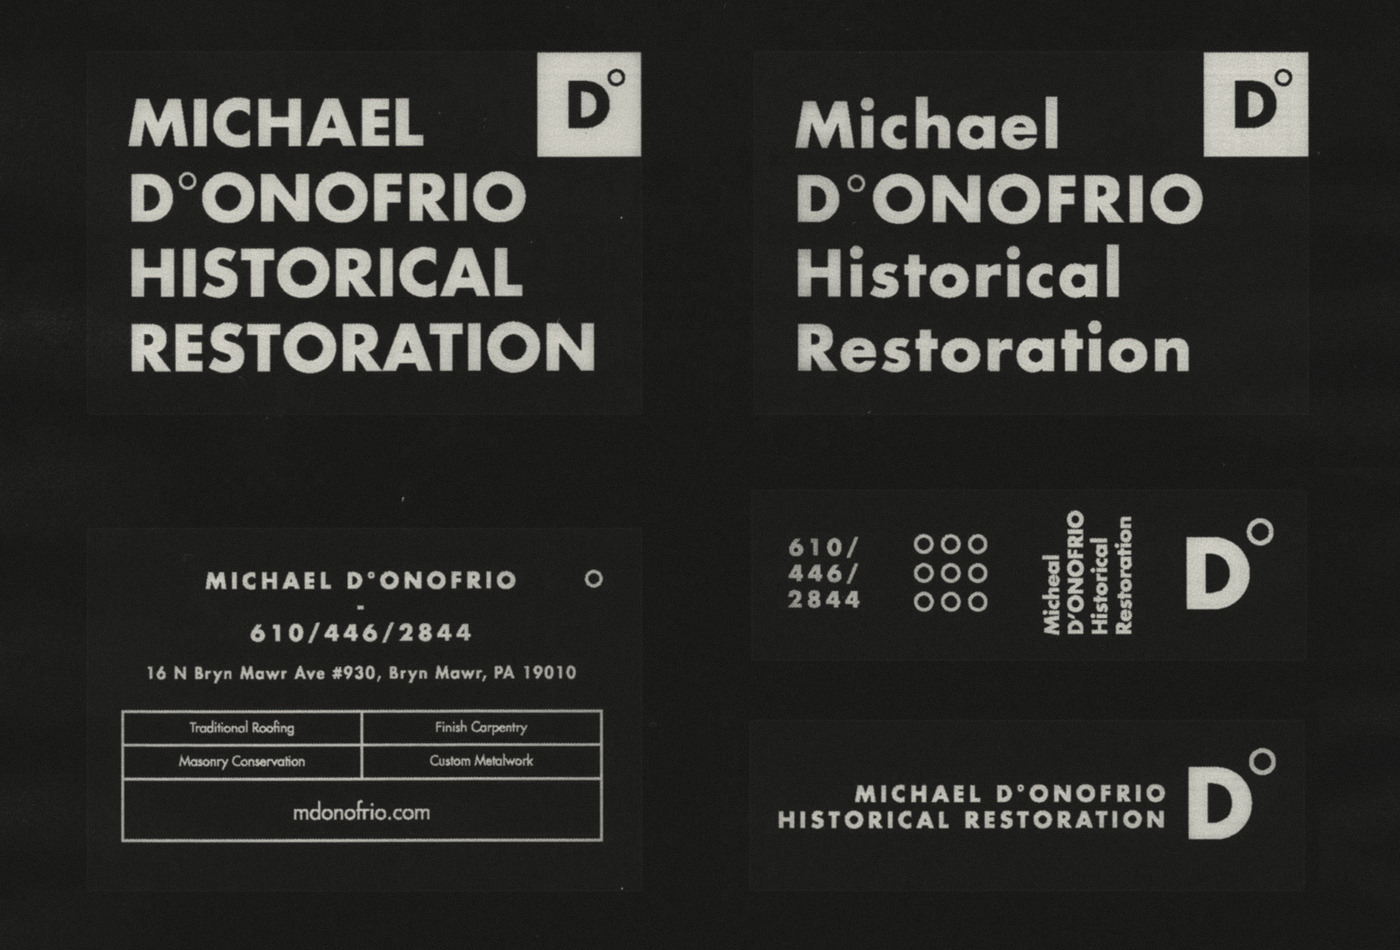 michael-donofrio-philadelphia-branding-vacaliebres